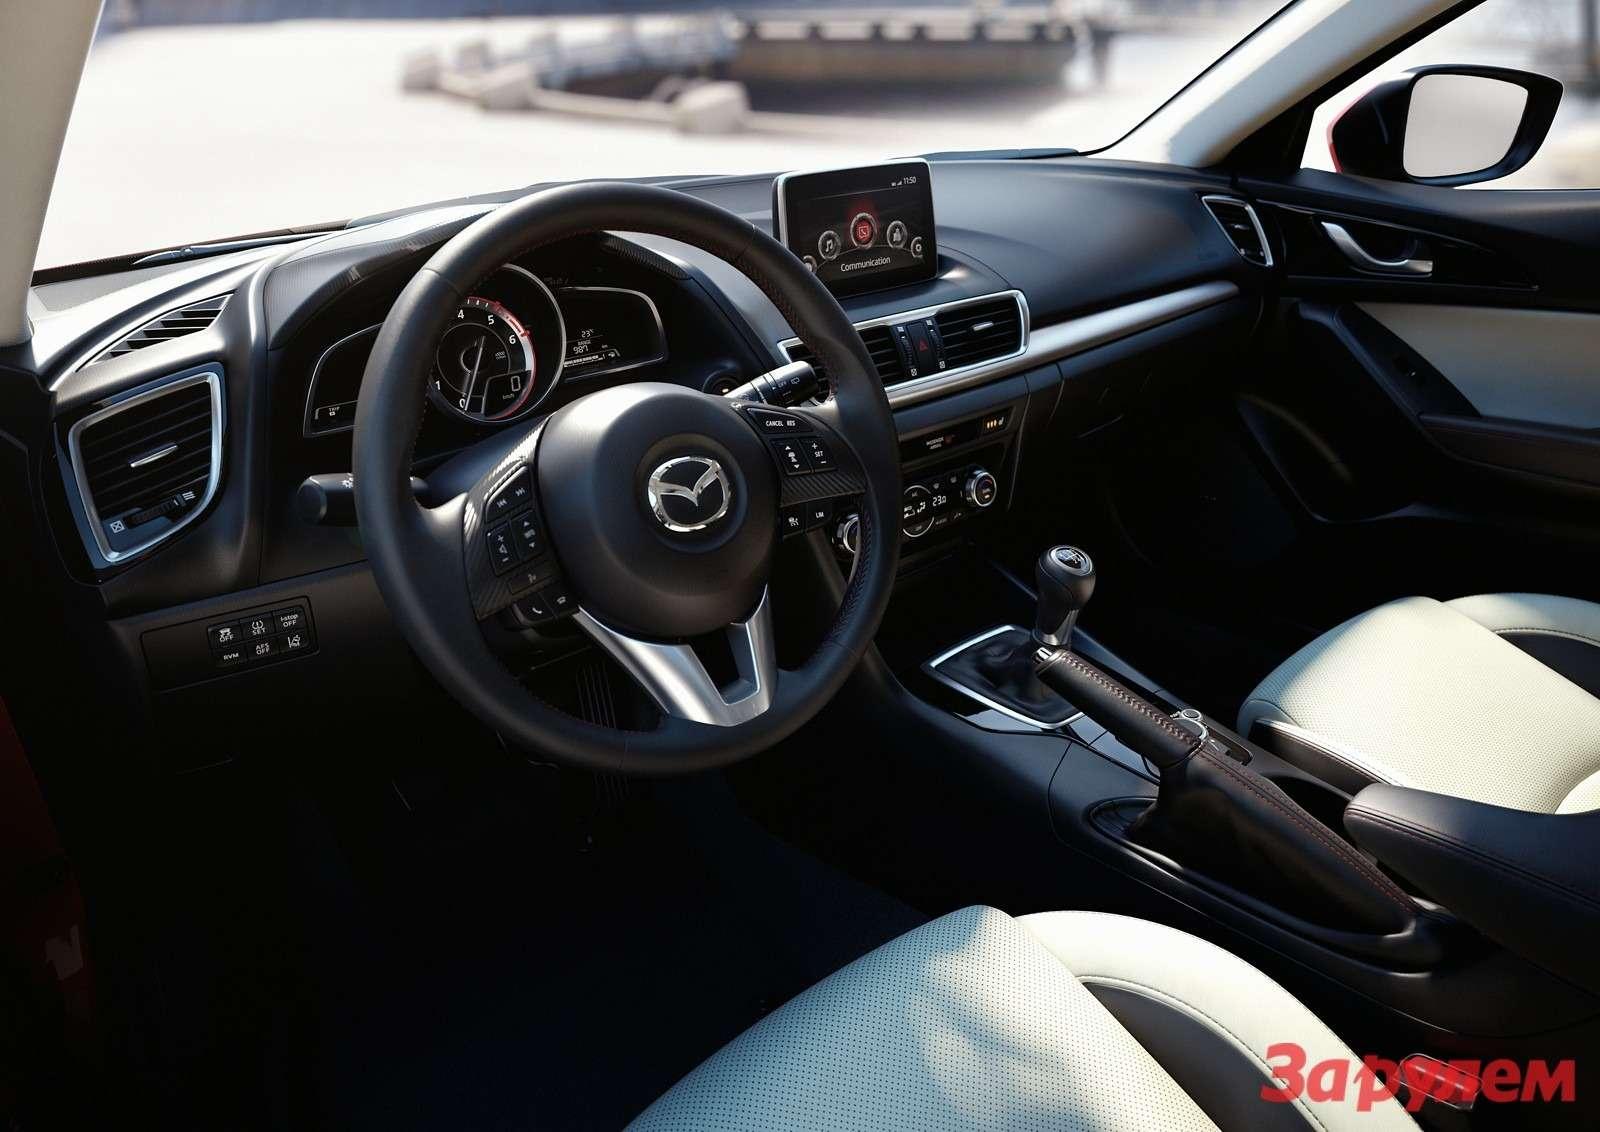 Mazda3 Hatchback 2013 interior 01copy